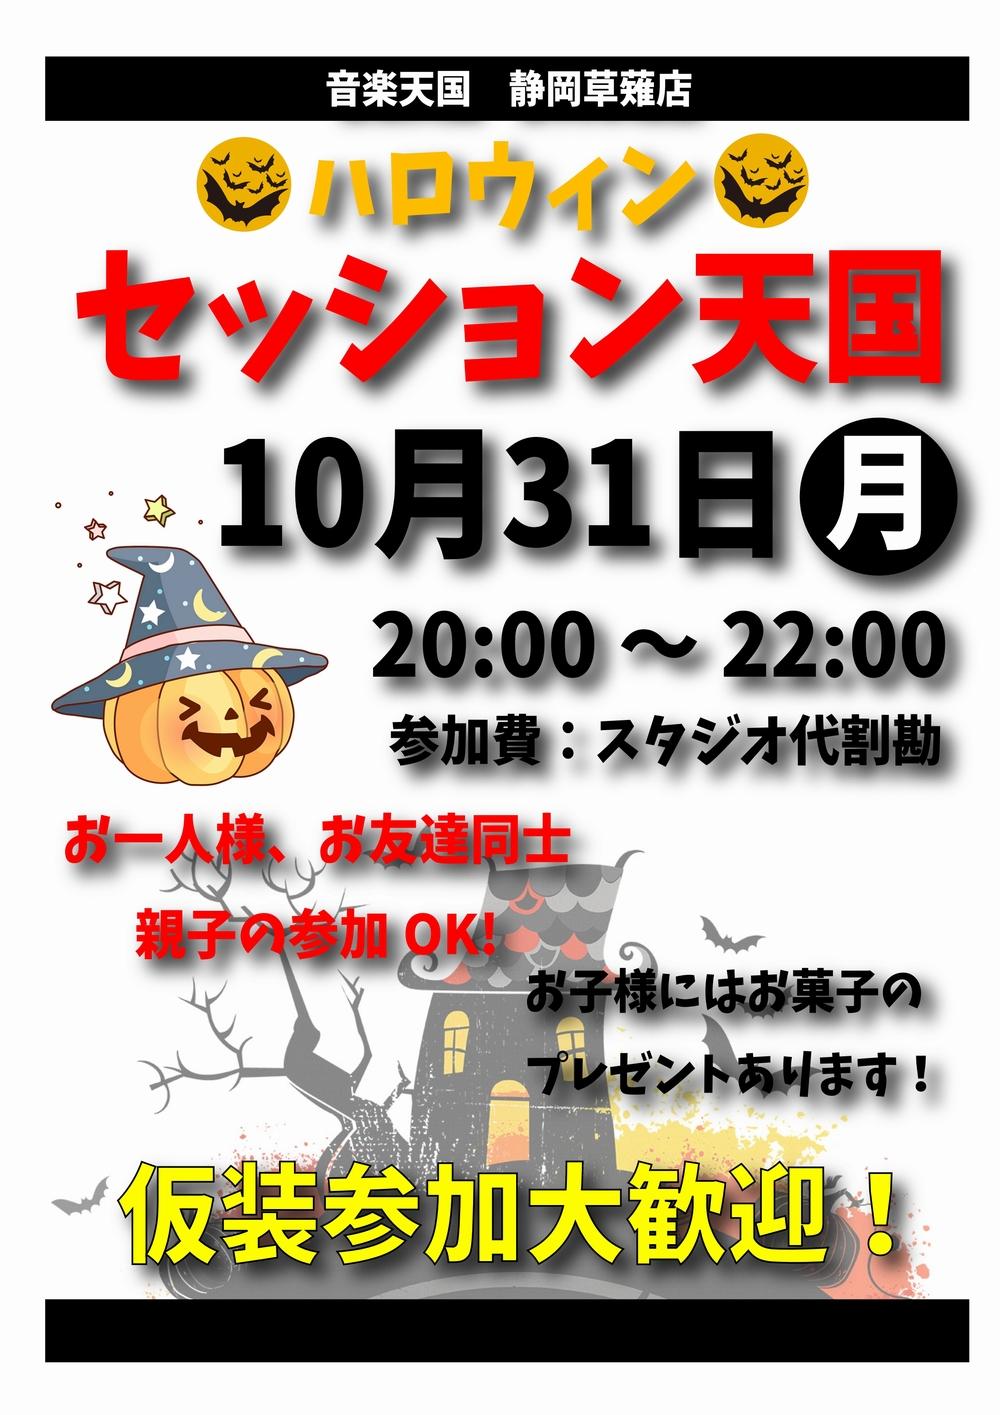 【セッション天国】音楽天国・静岡草薙店10月31日(月)開催!